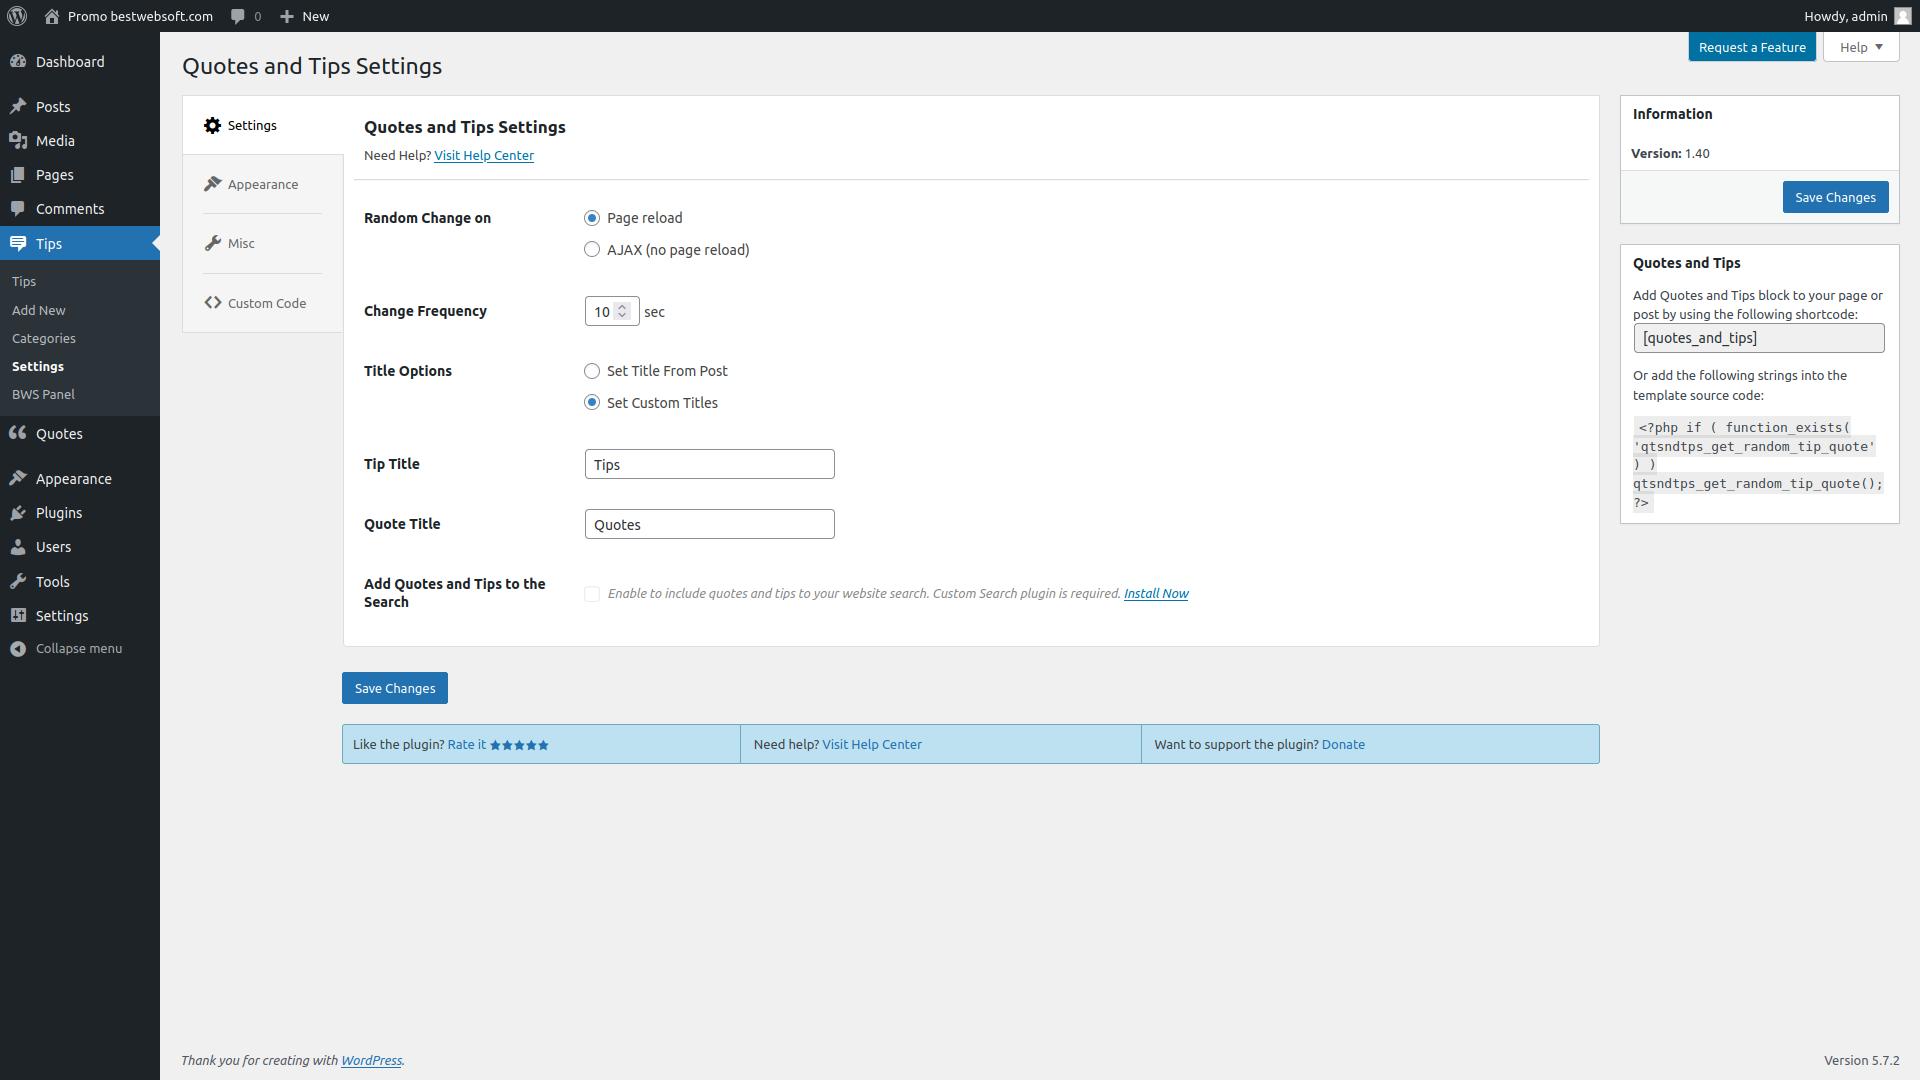 bestwebsoft's like & share screenshot 6